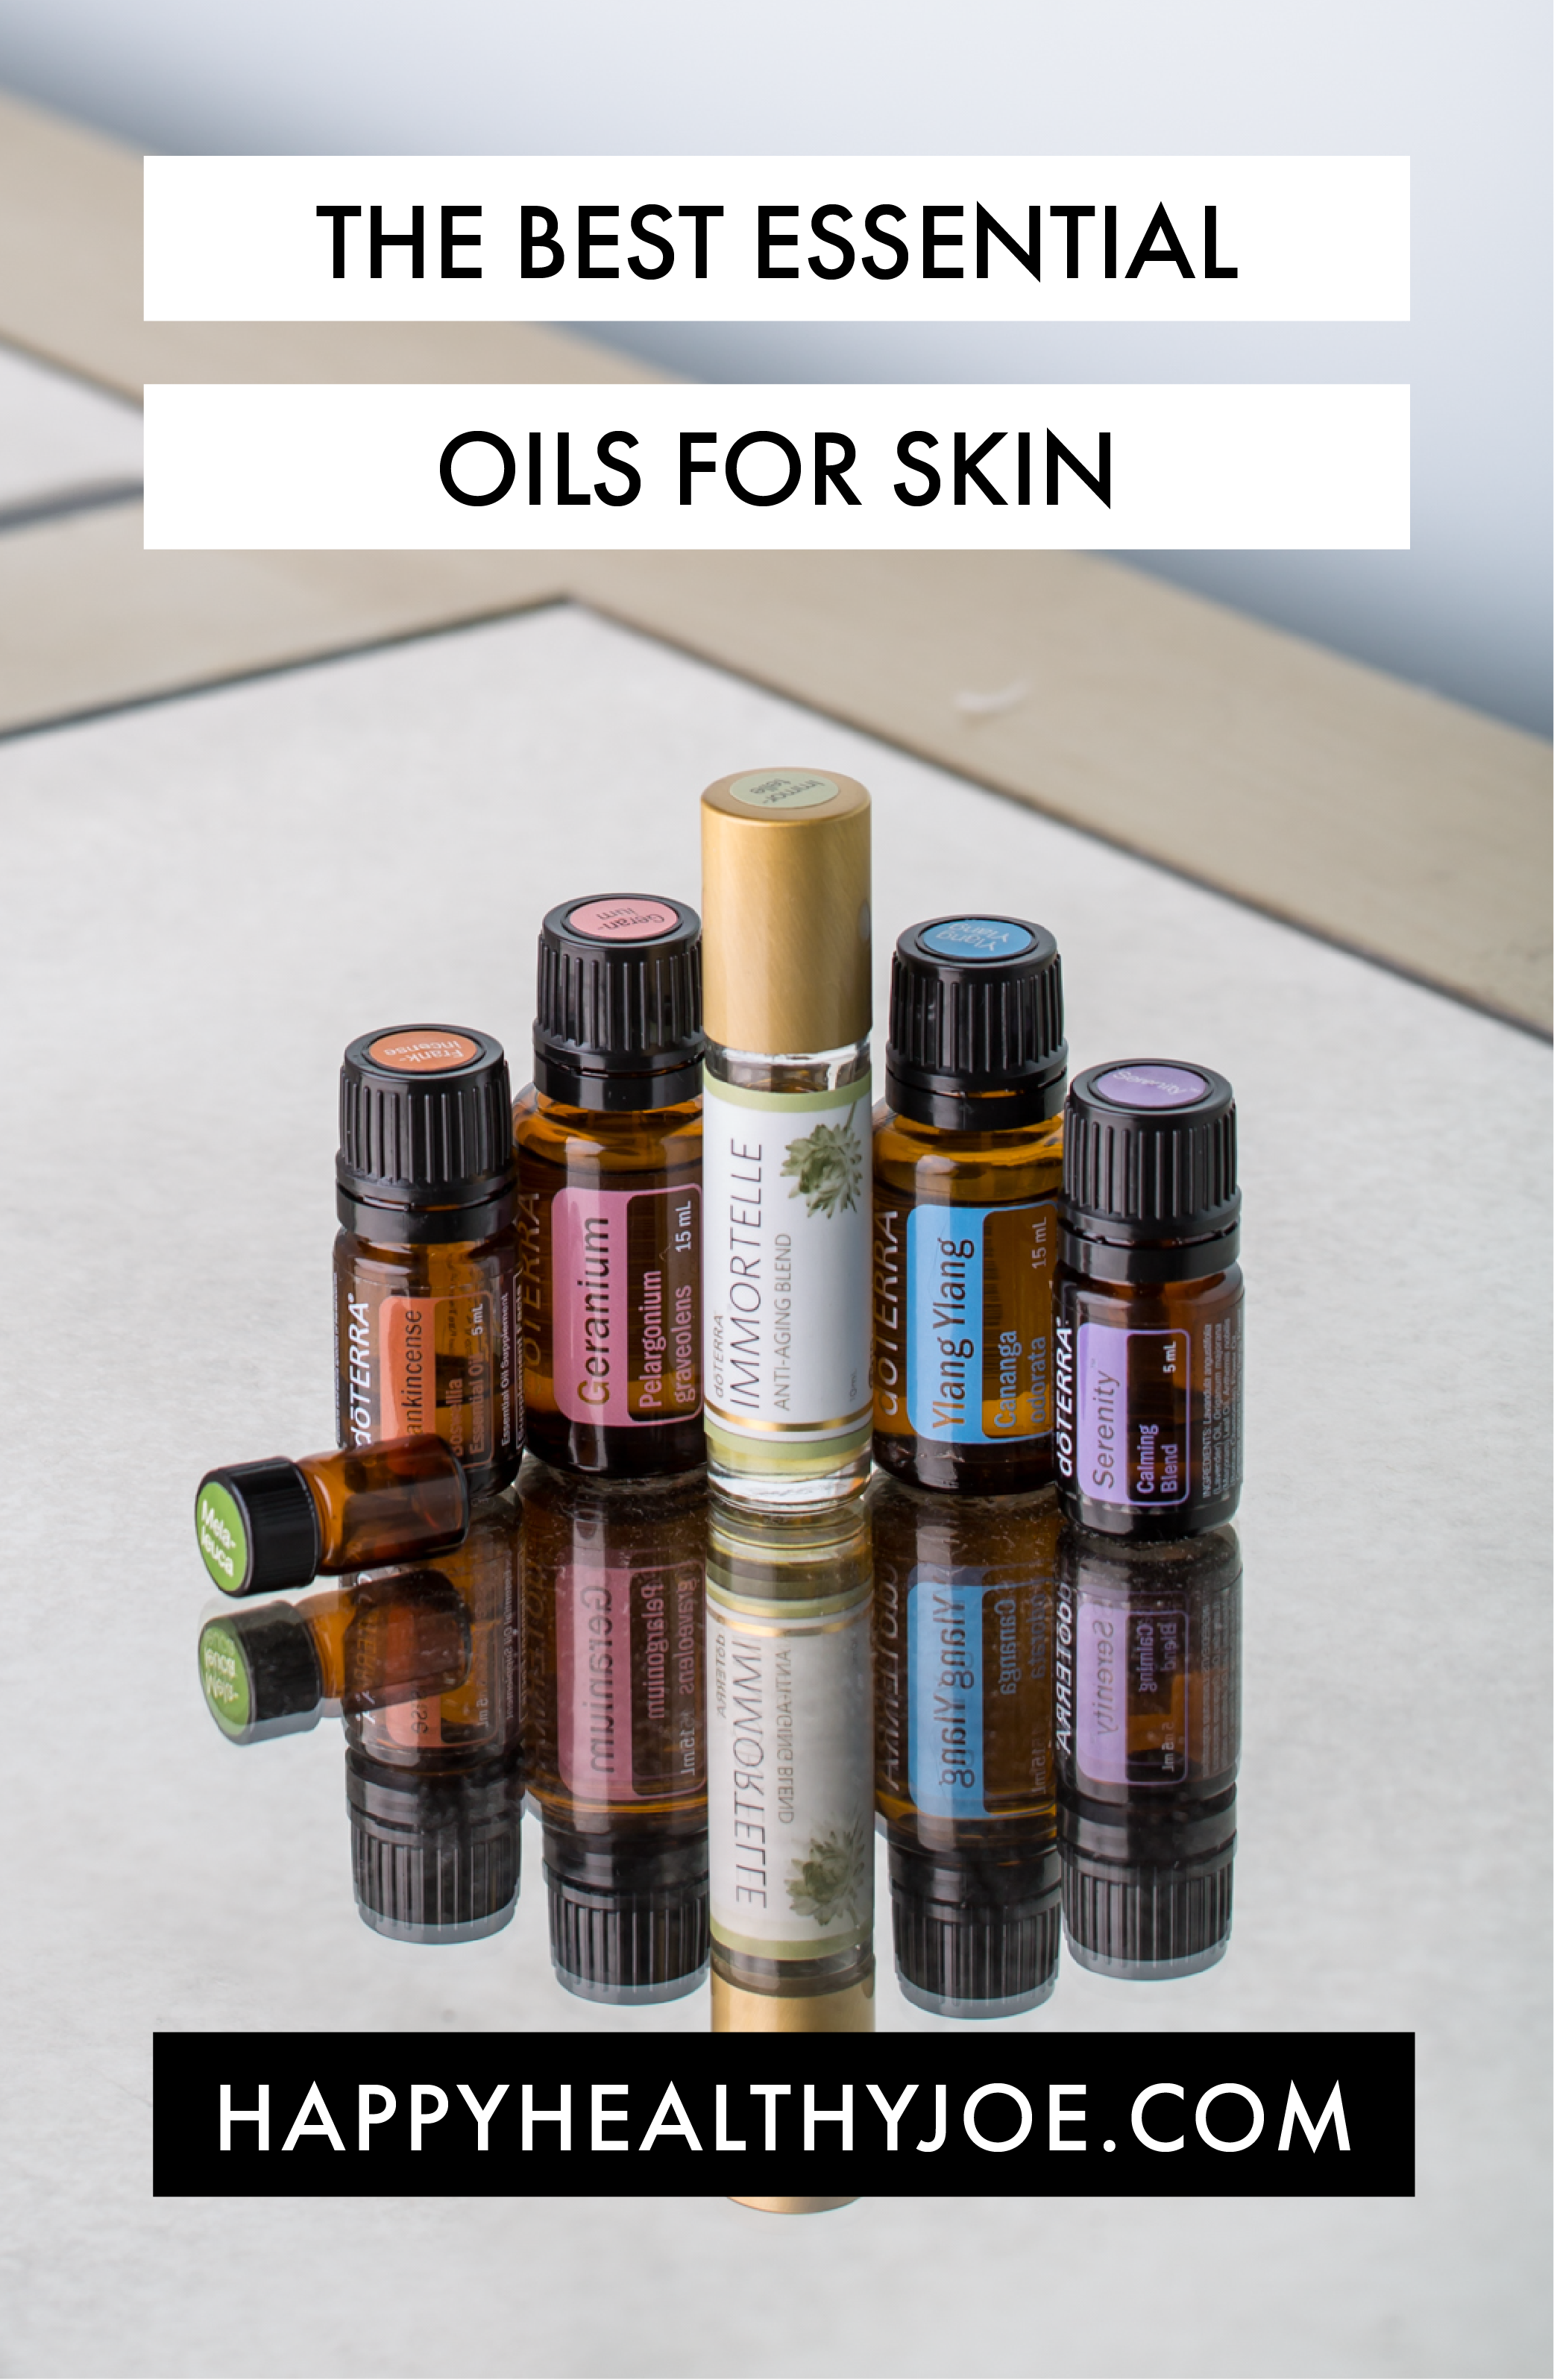 The Best doTERRA Essential Oils For Skin | Happy Healthy Joe